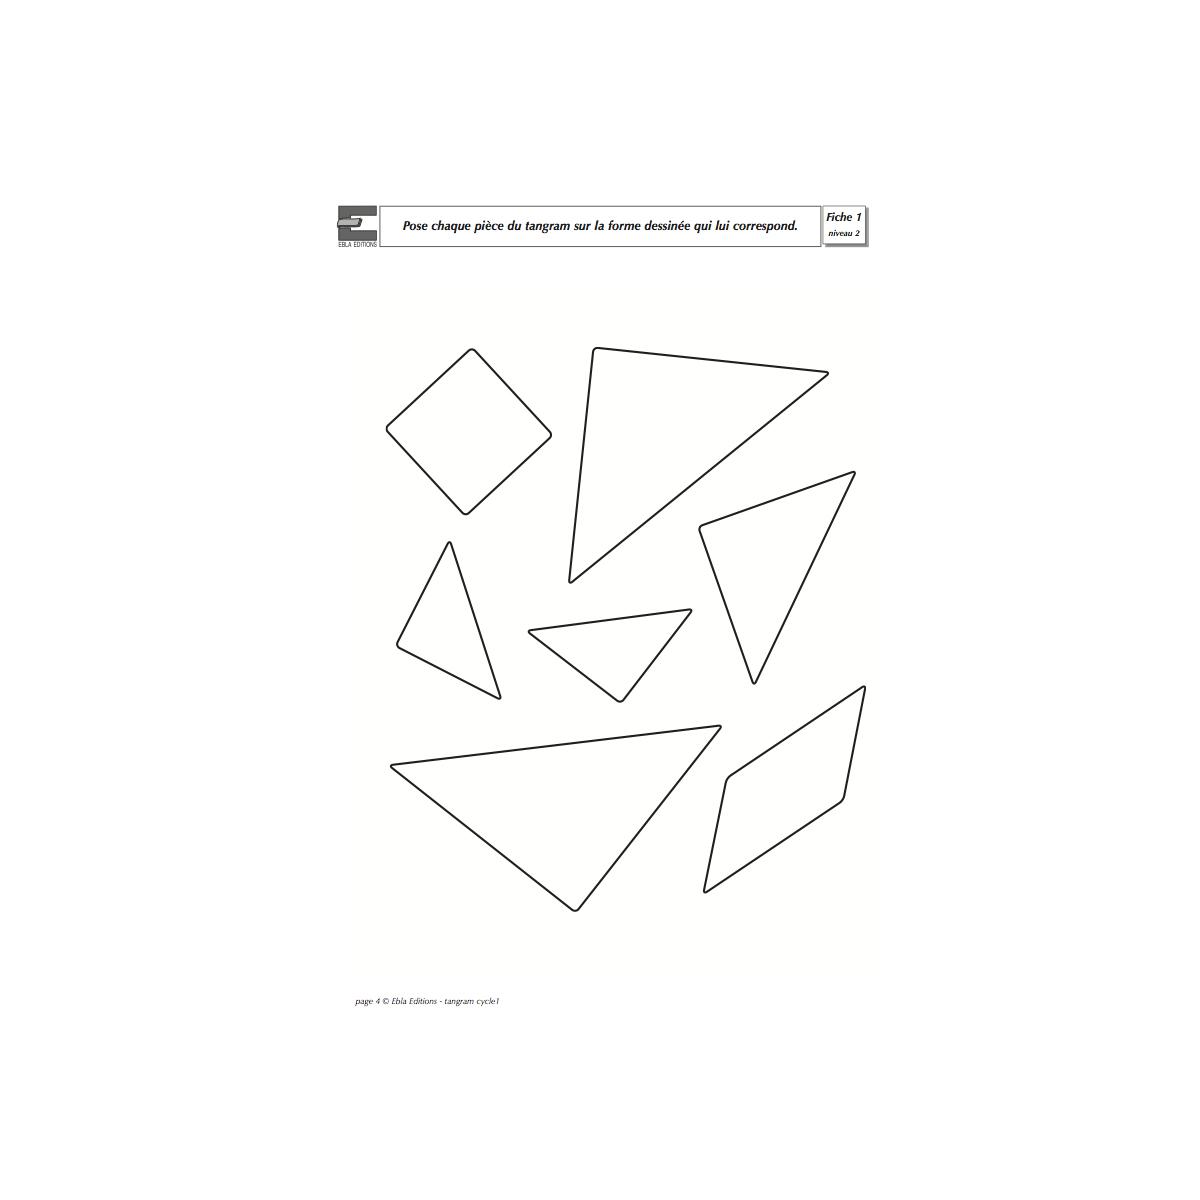 Fichier Tangram 3/5 Ans - Cycle 1 - Ebla Editions intérieur Tangram Cycle 3